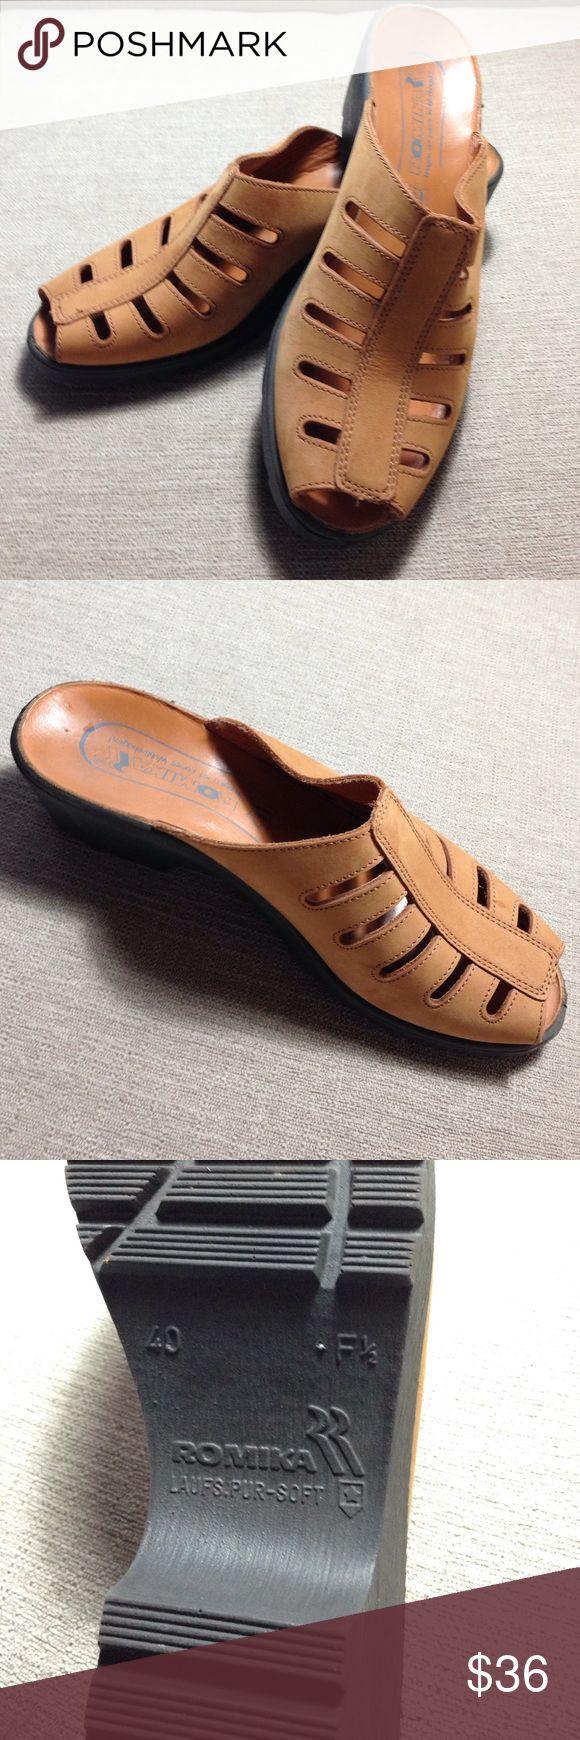 ❗️SALE❗️Romika tan suede sandals Romika tan suede sandals. Open-toed Romika Shoes Sandals